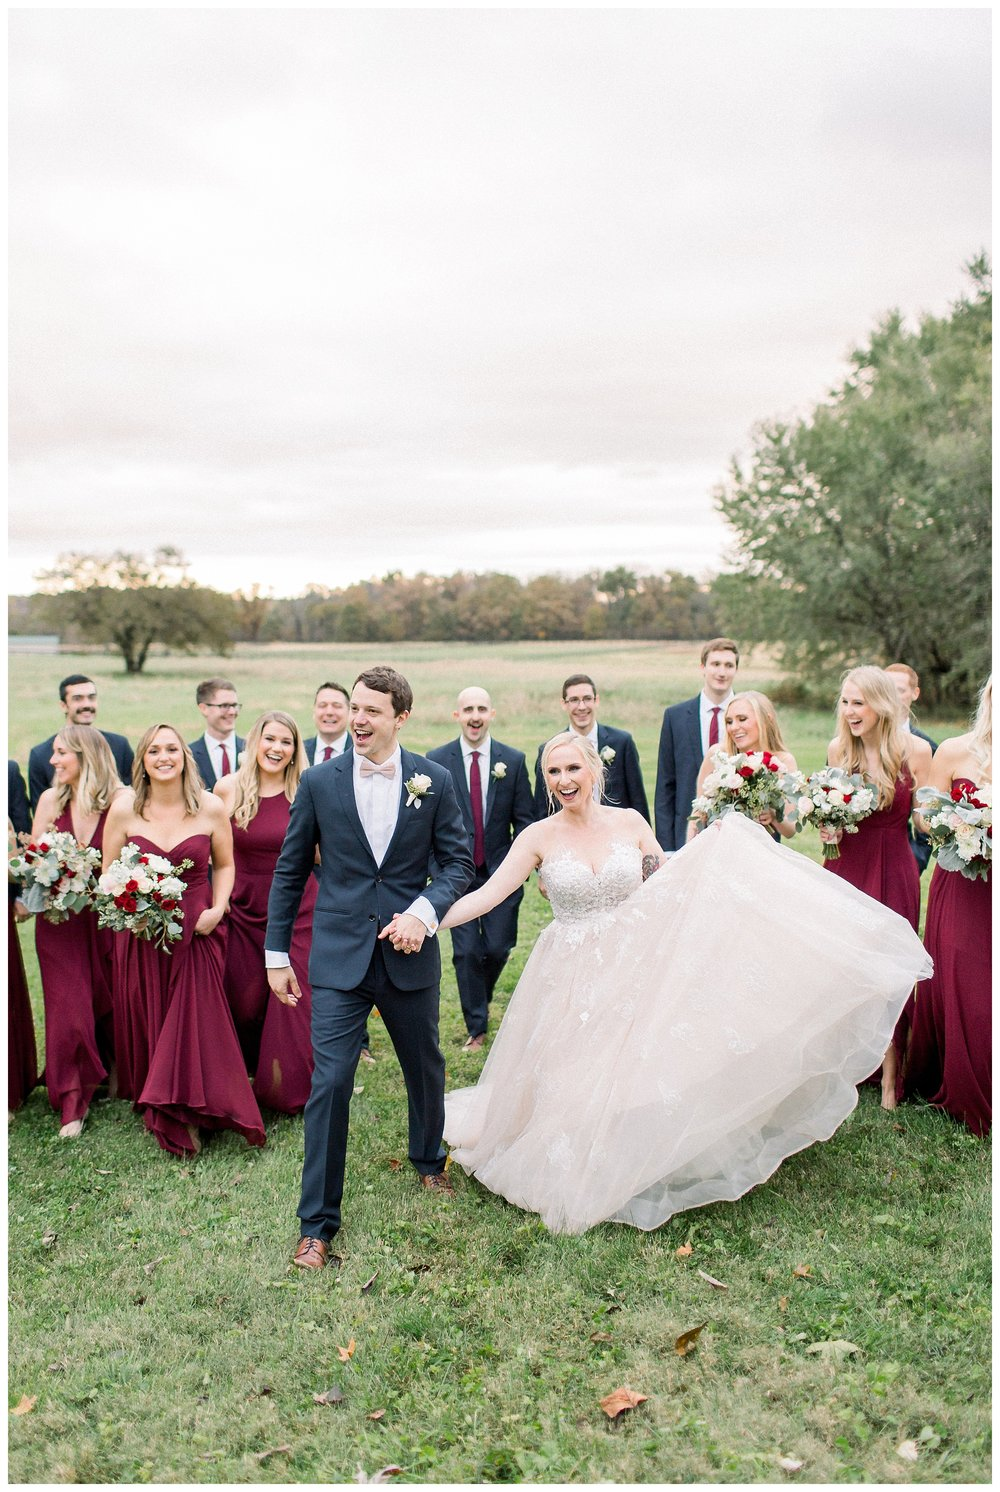 Whitehall Estate Wedding | Northern Virginia Wedding Photographer Kir Tuben_0000.jpg